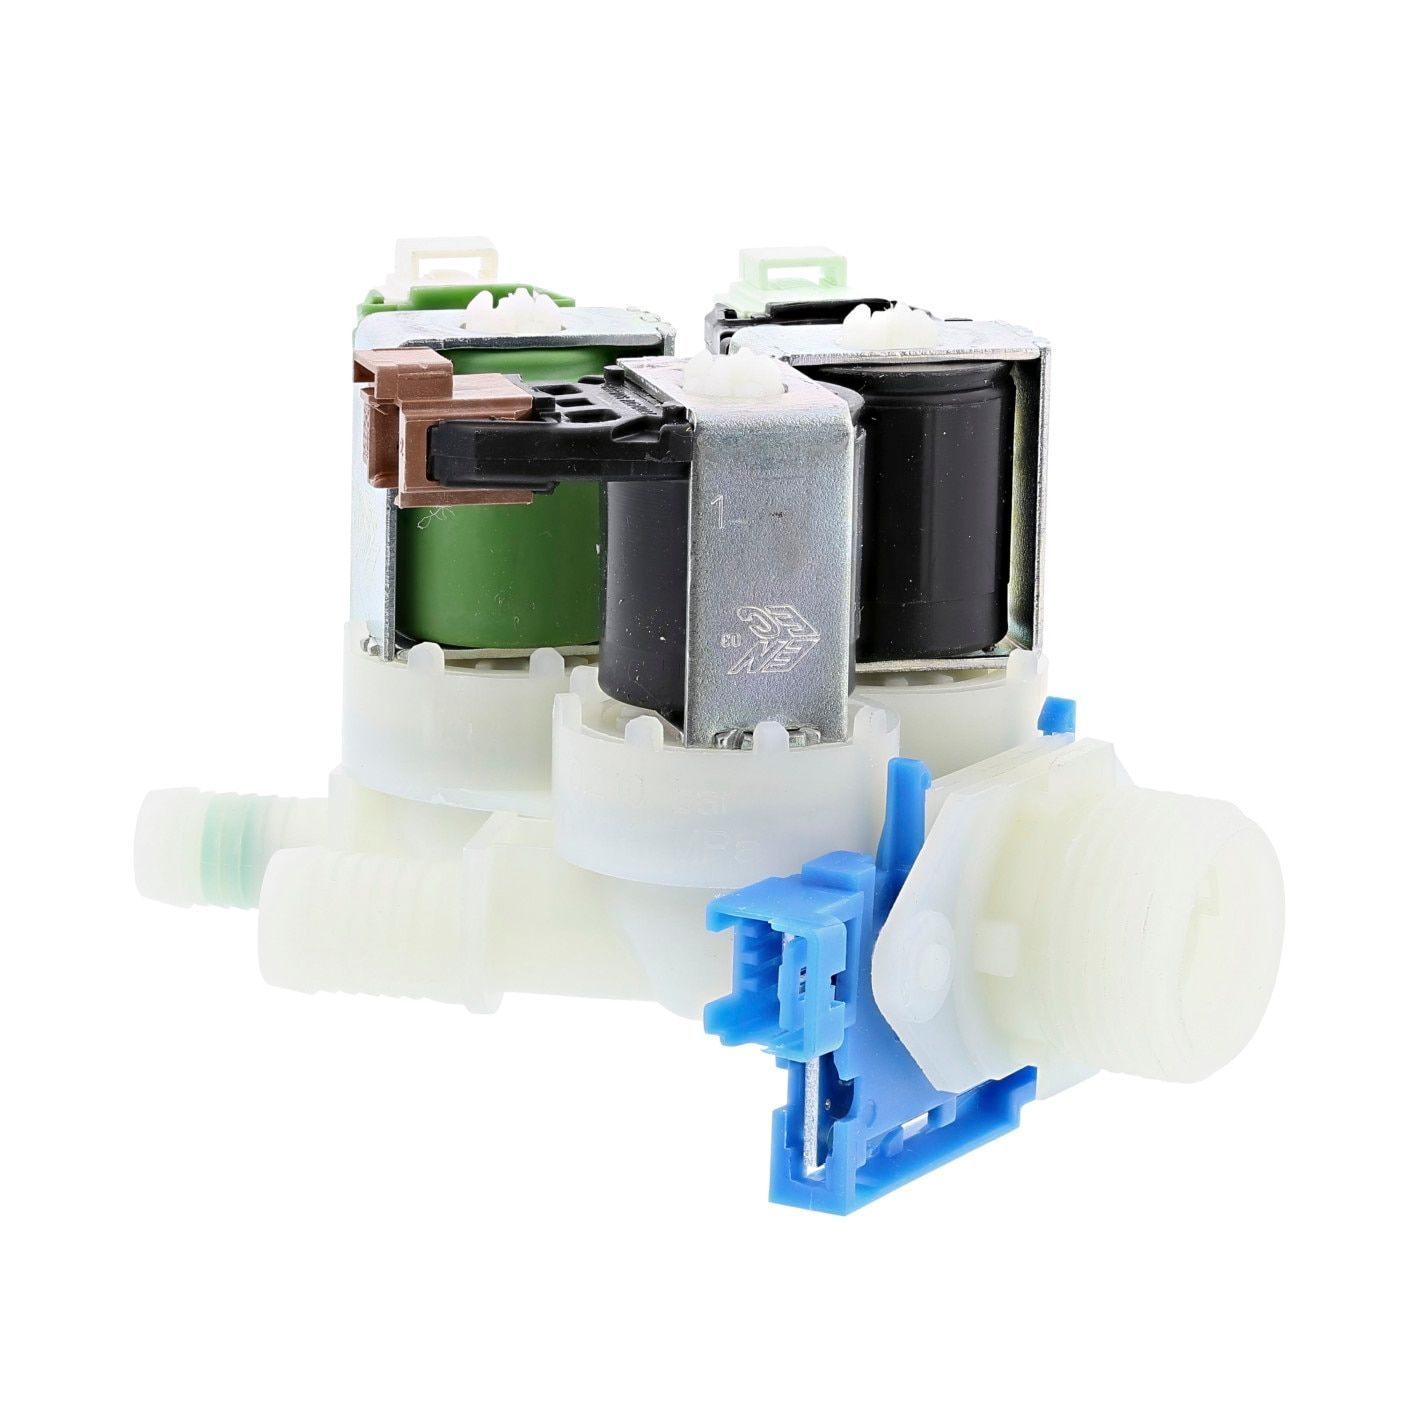 Napouštěcí elektroventil praček AEG Electrolux Zanussi - 1325188405 AEG / Electrolux / Zanussi